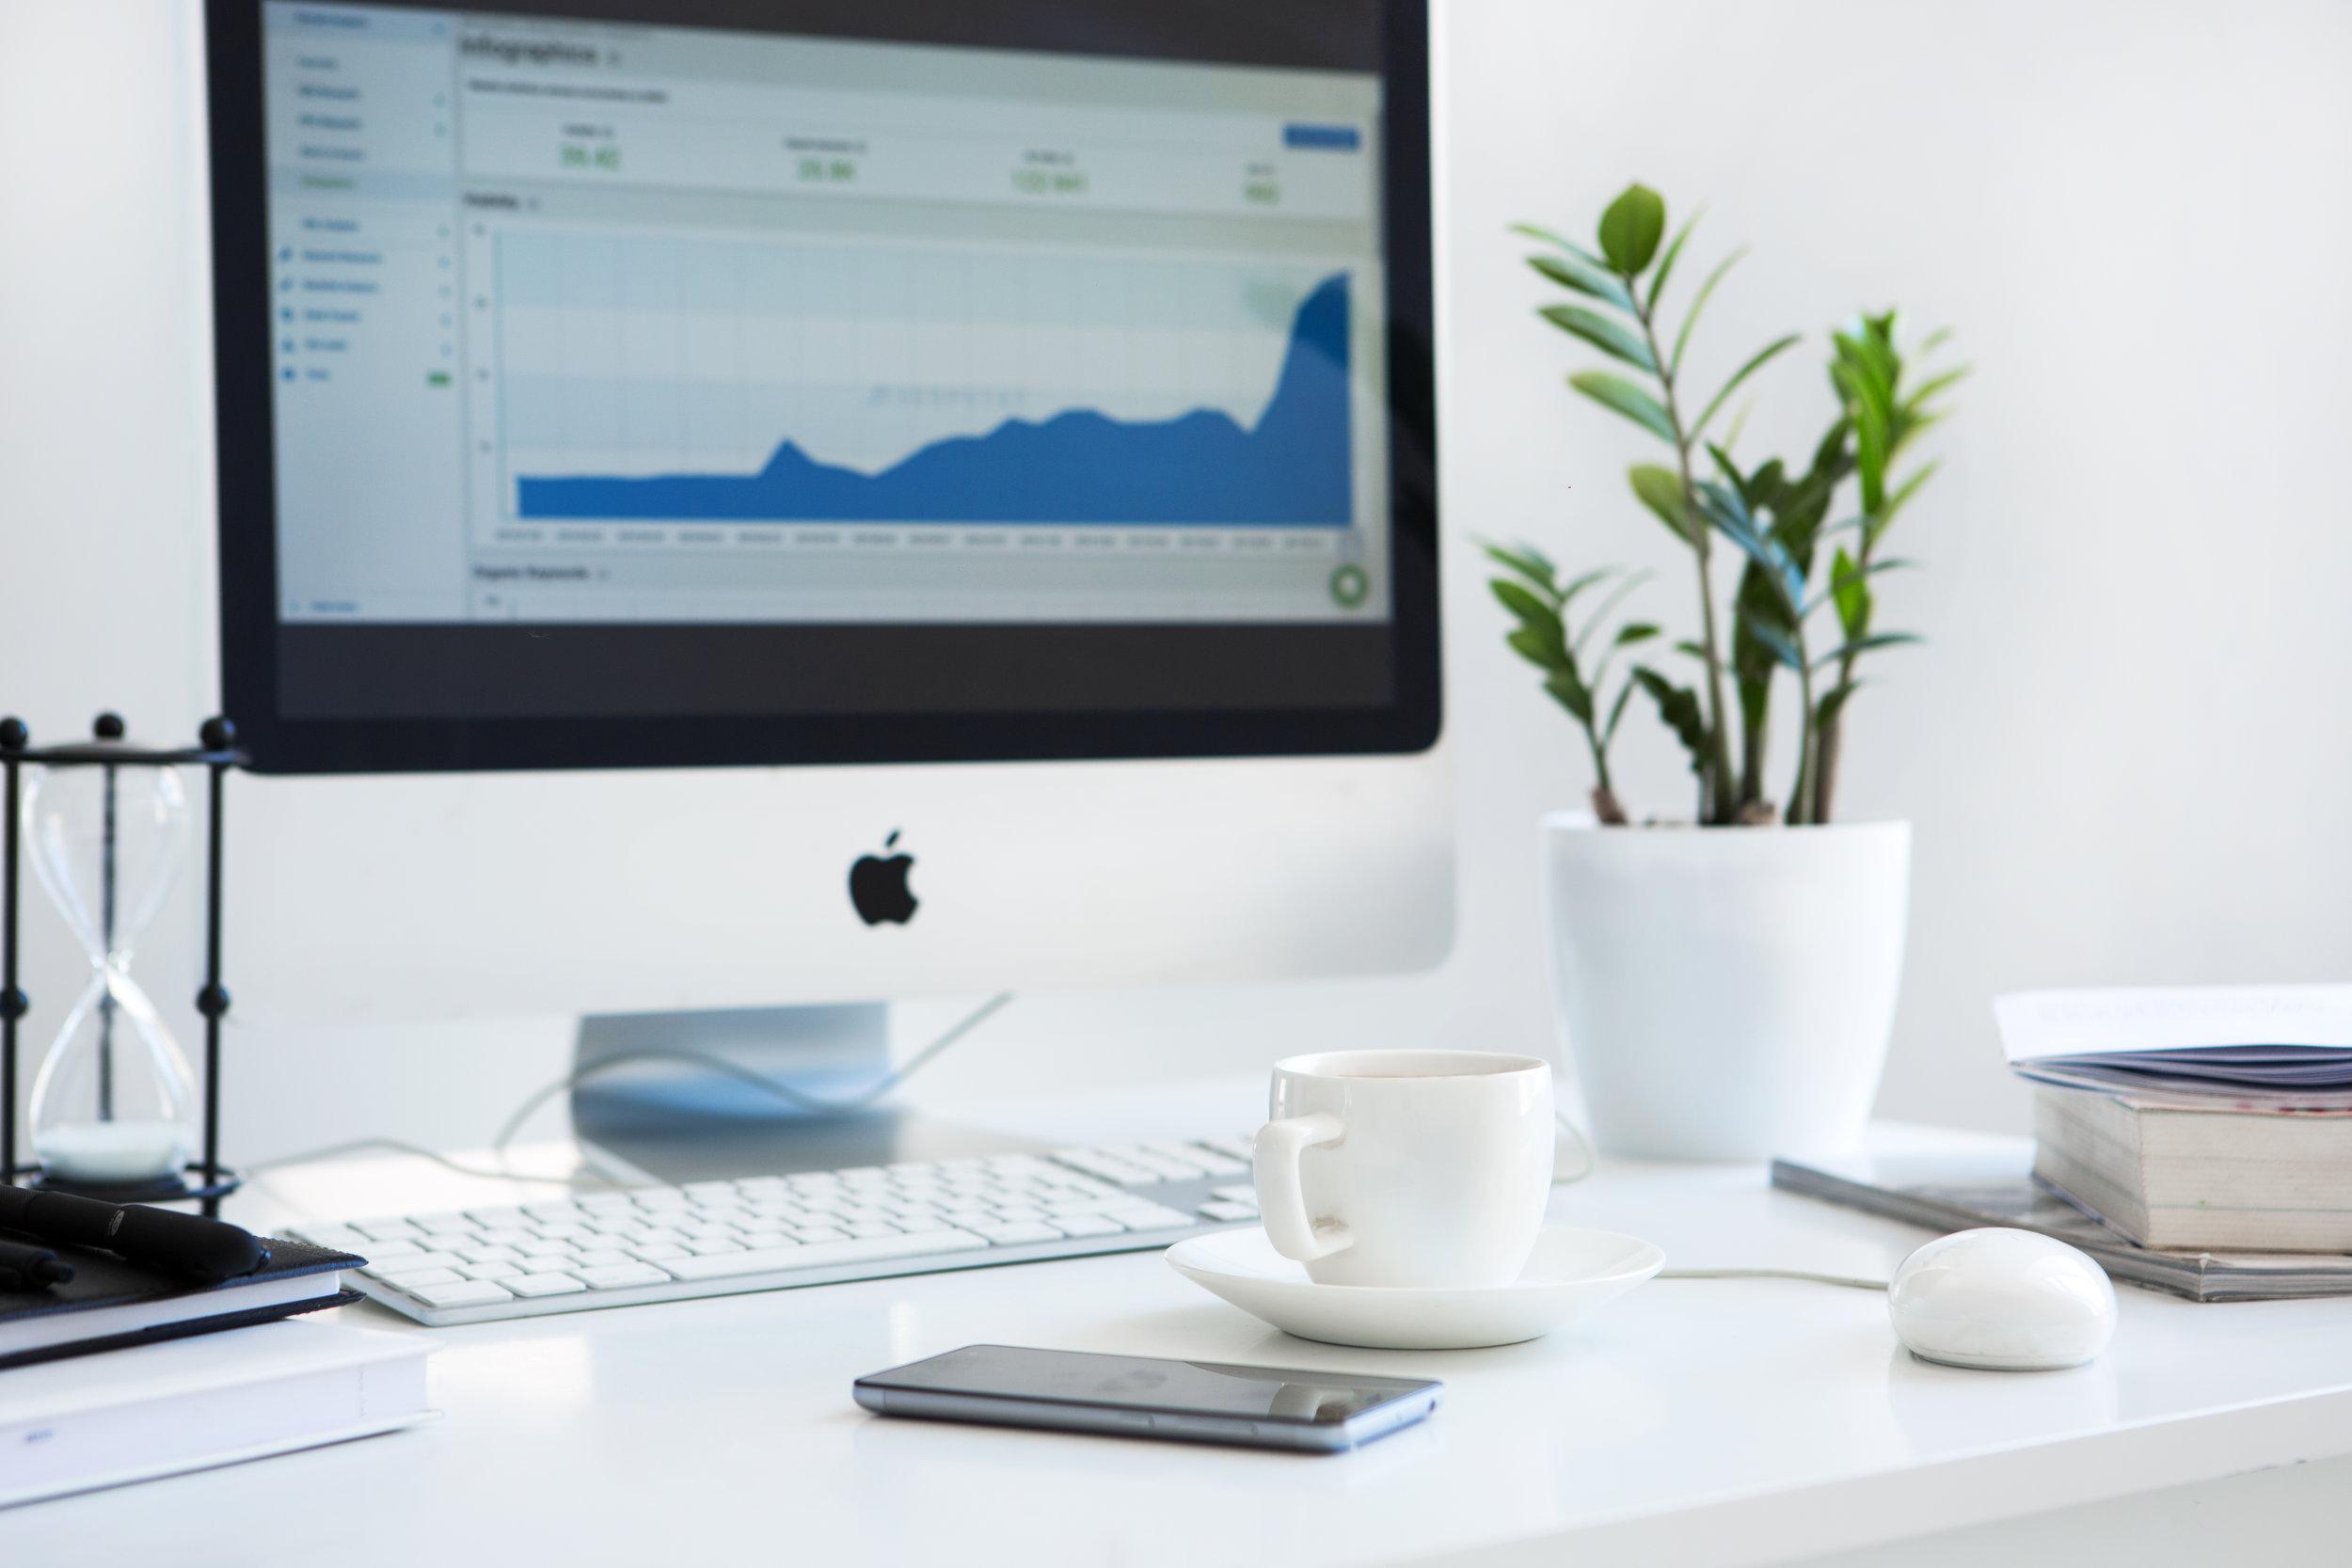 laptop with analytics 2.jpg